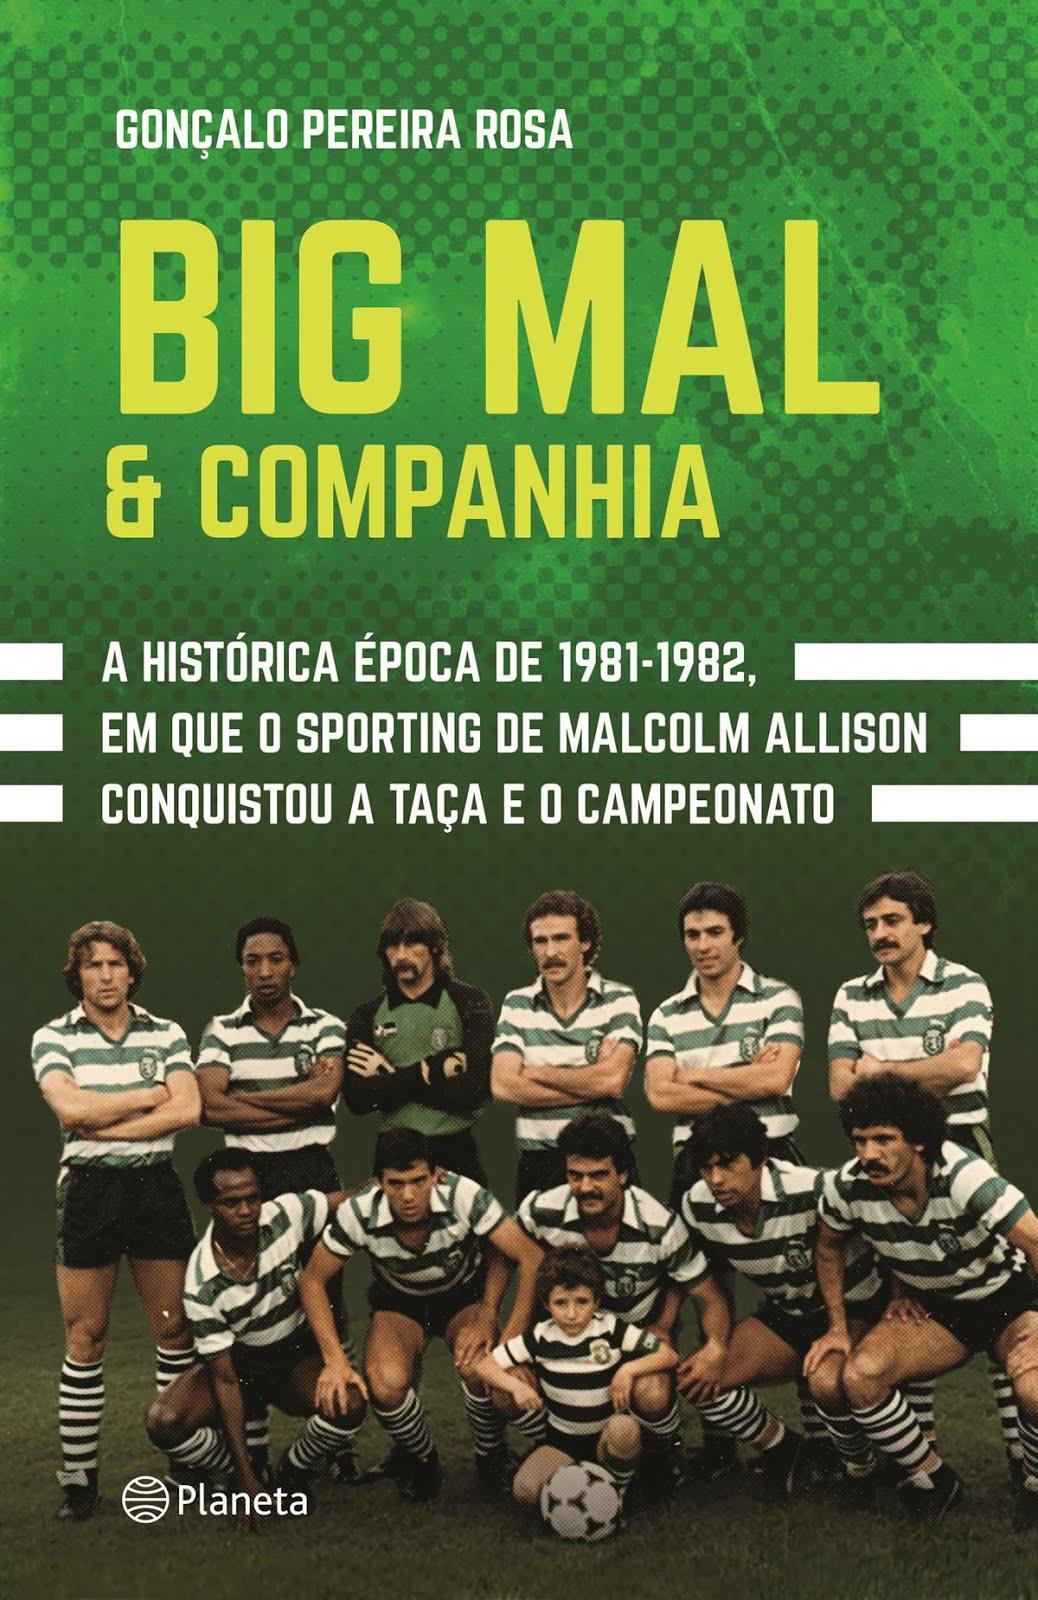 Big Mal & Companhia (2018)